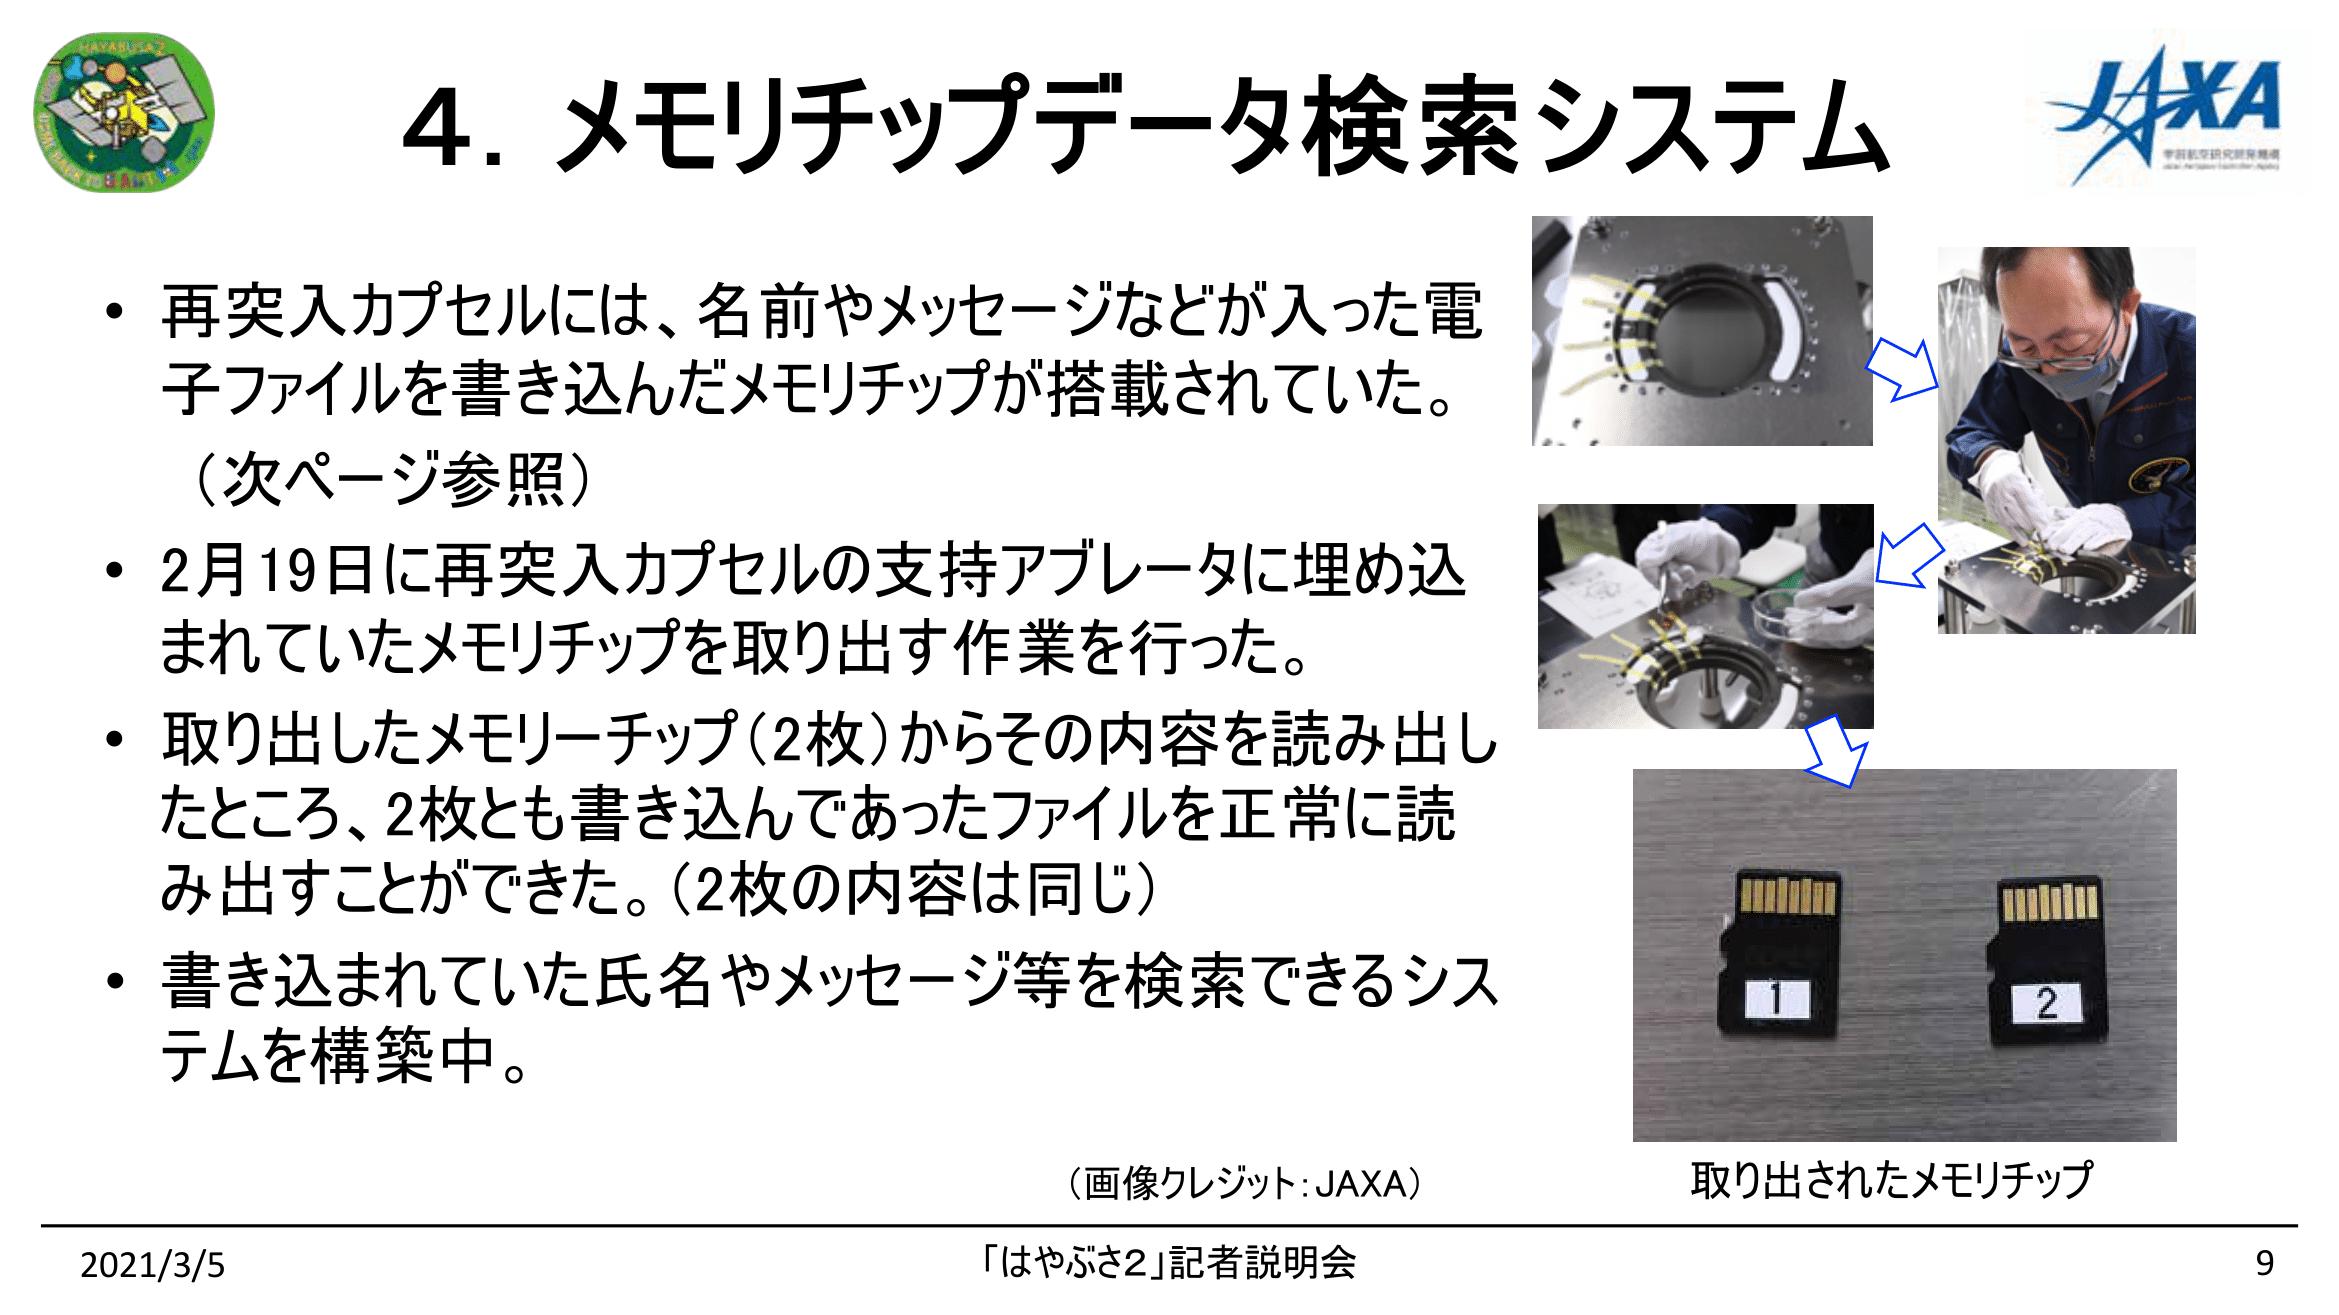 f:id:Imamura:20210305134137p:plain